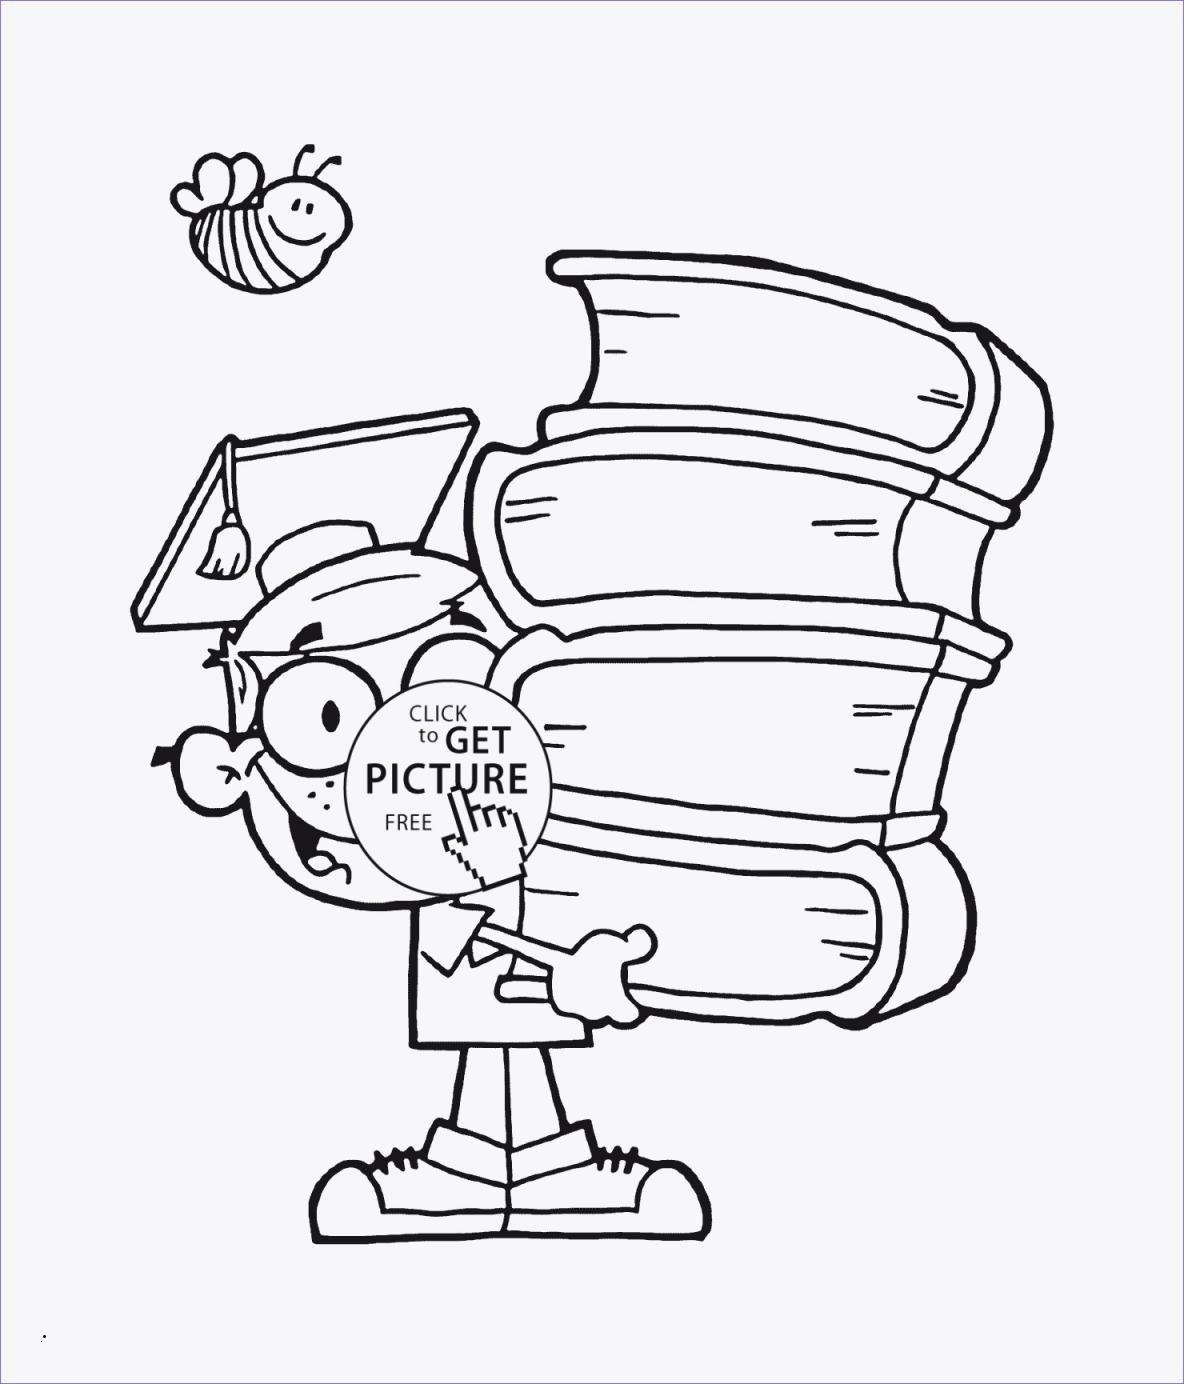 T Rex Malvorlage Genial Malvorlagen Igel Frisch Igel Grundschule 0d Archives Uploadertalk Stock